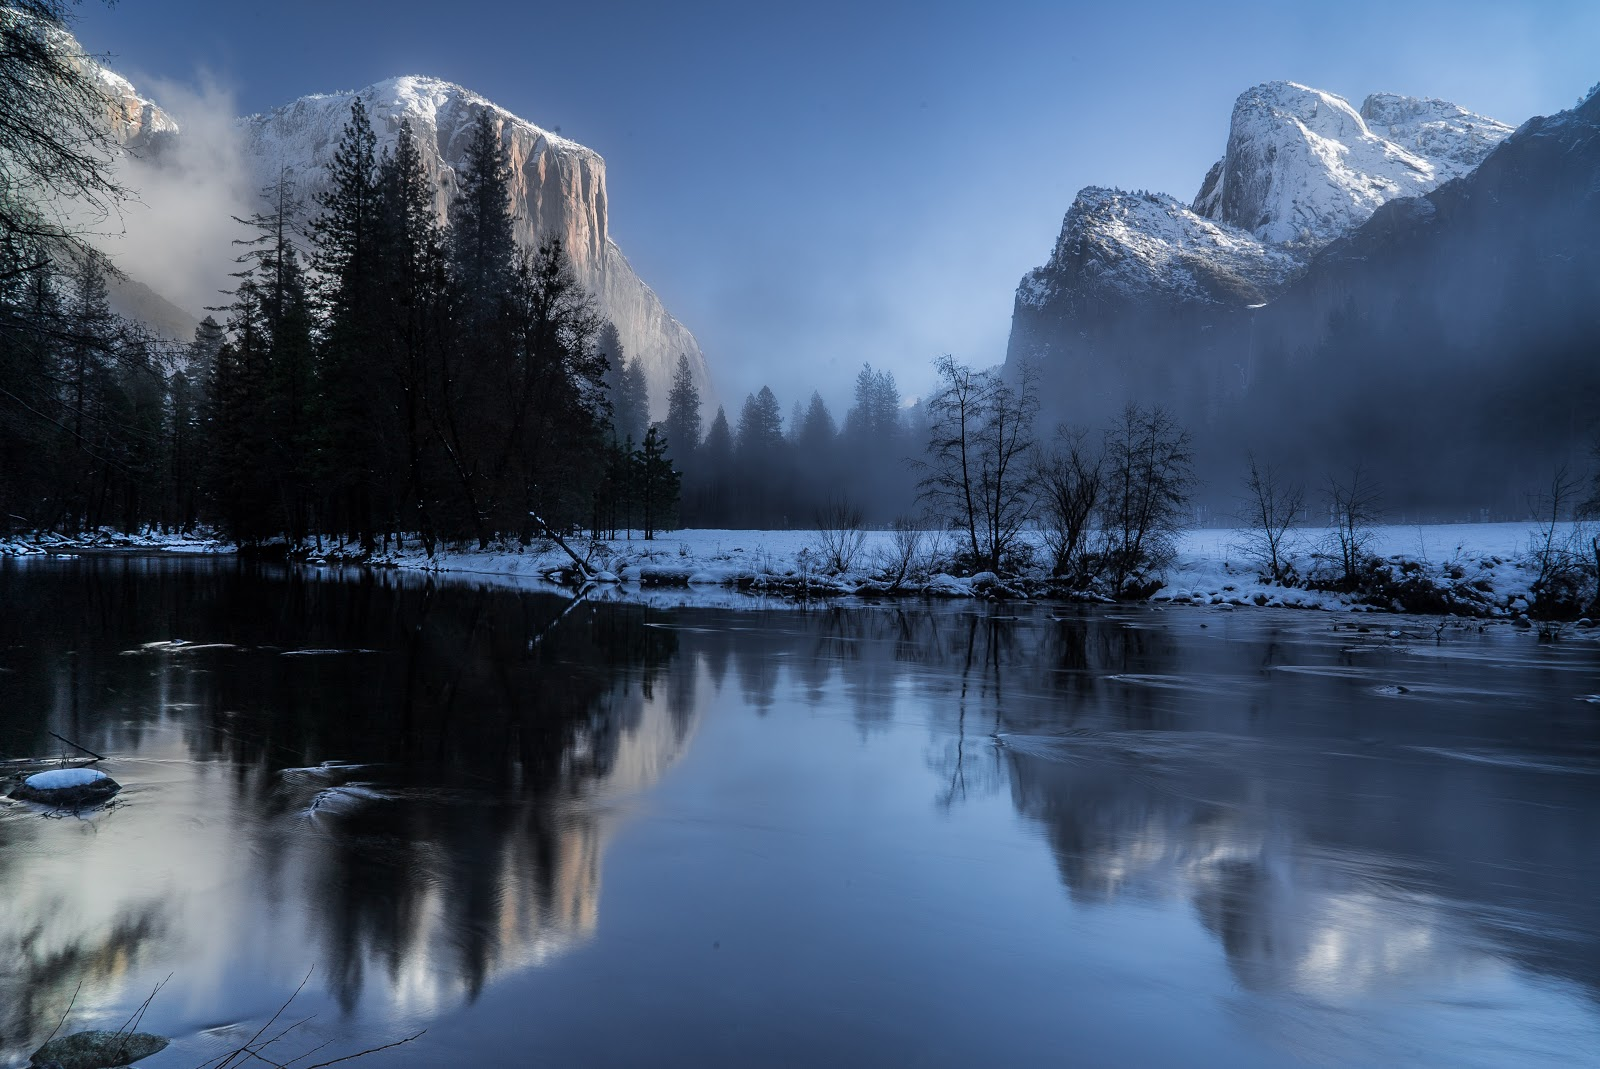 Magical Scenery of Winter in Yosemite